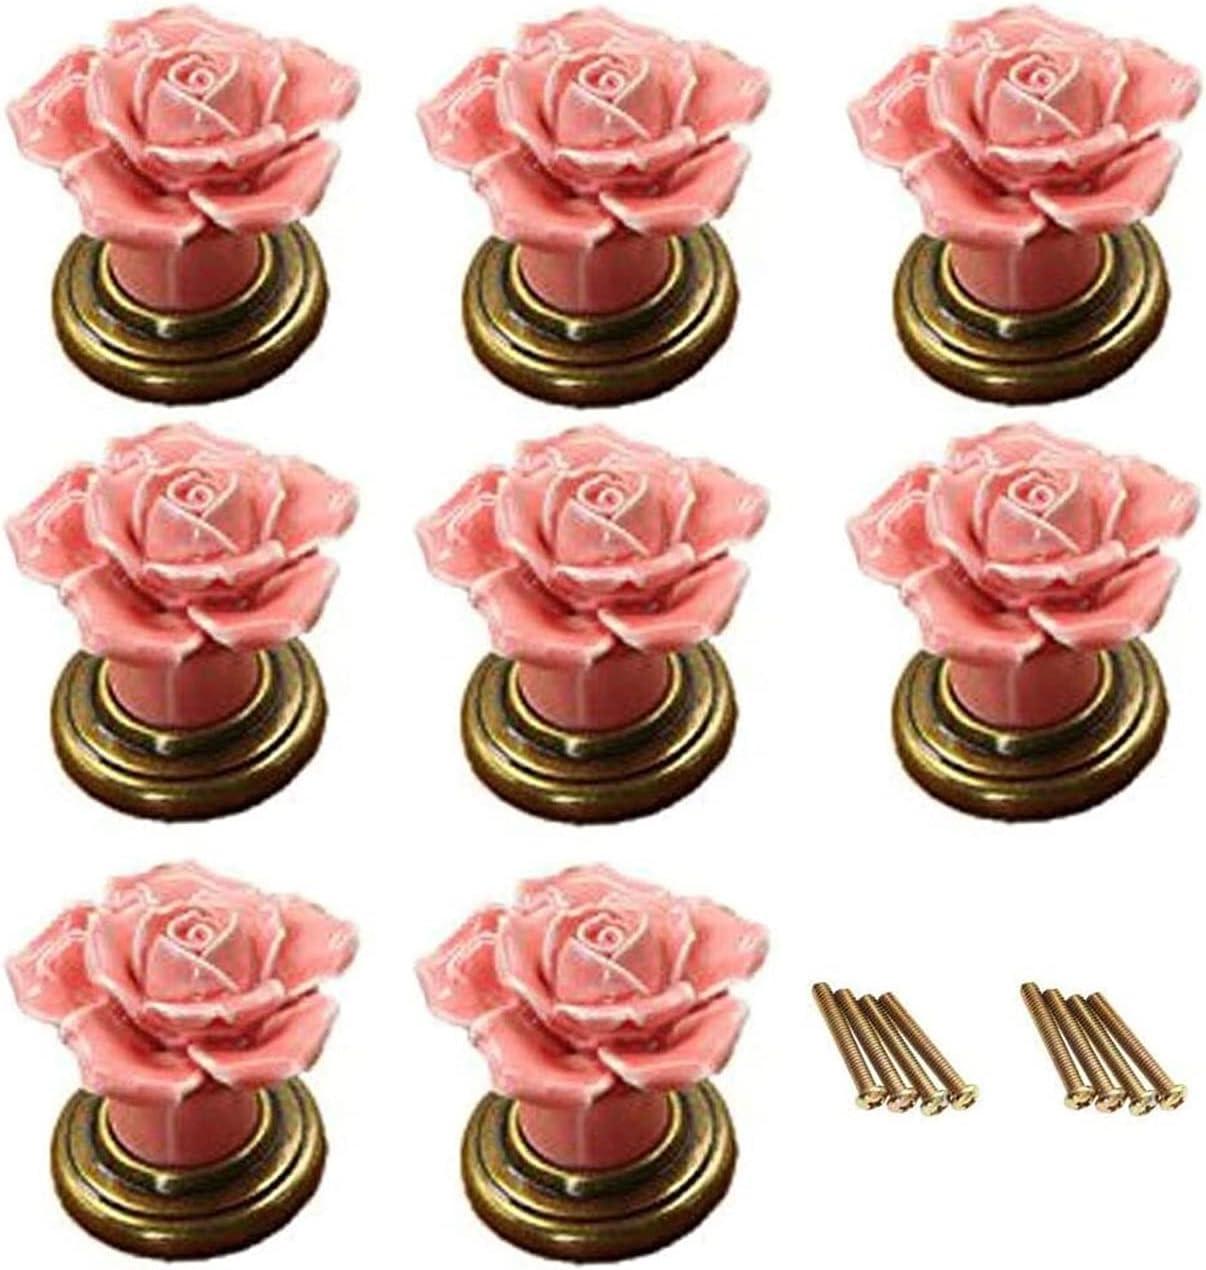 Drawer Dresser Knobs Pull Handles Pink Ceramic Rose Flower specialty shop Daily bargain sale 8Pcs